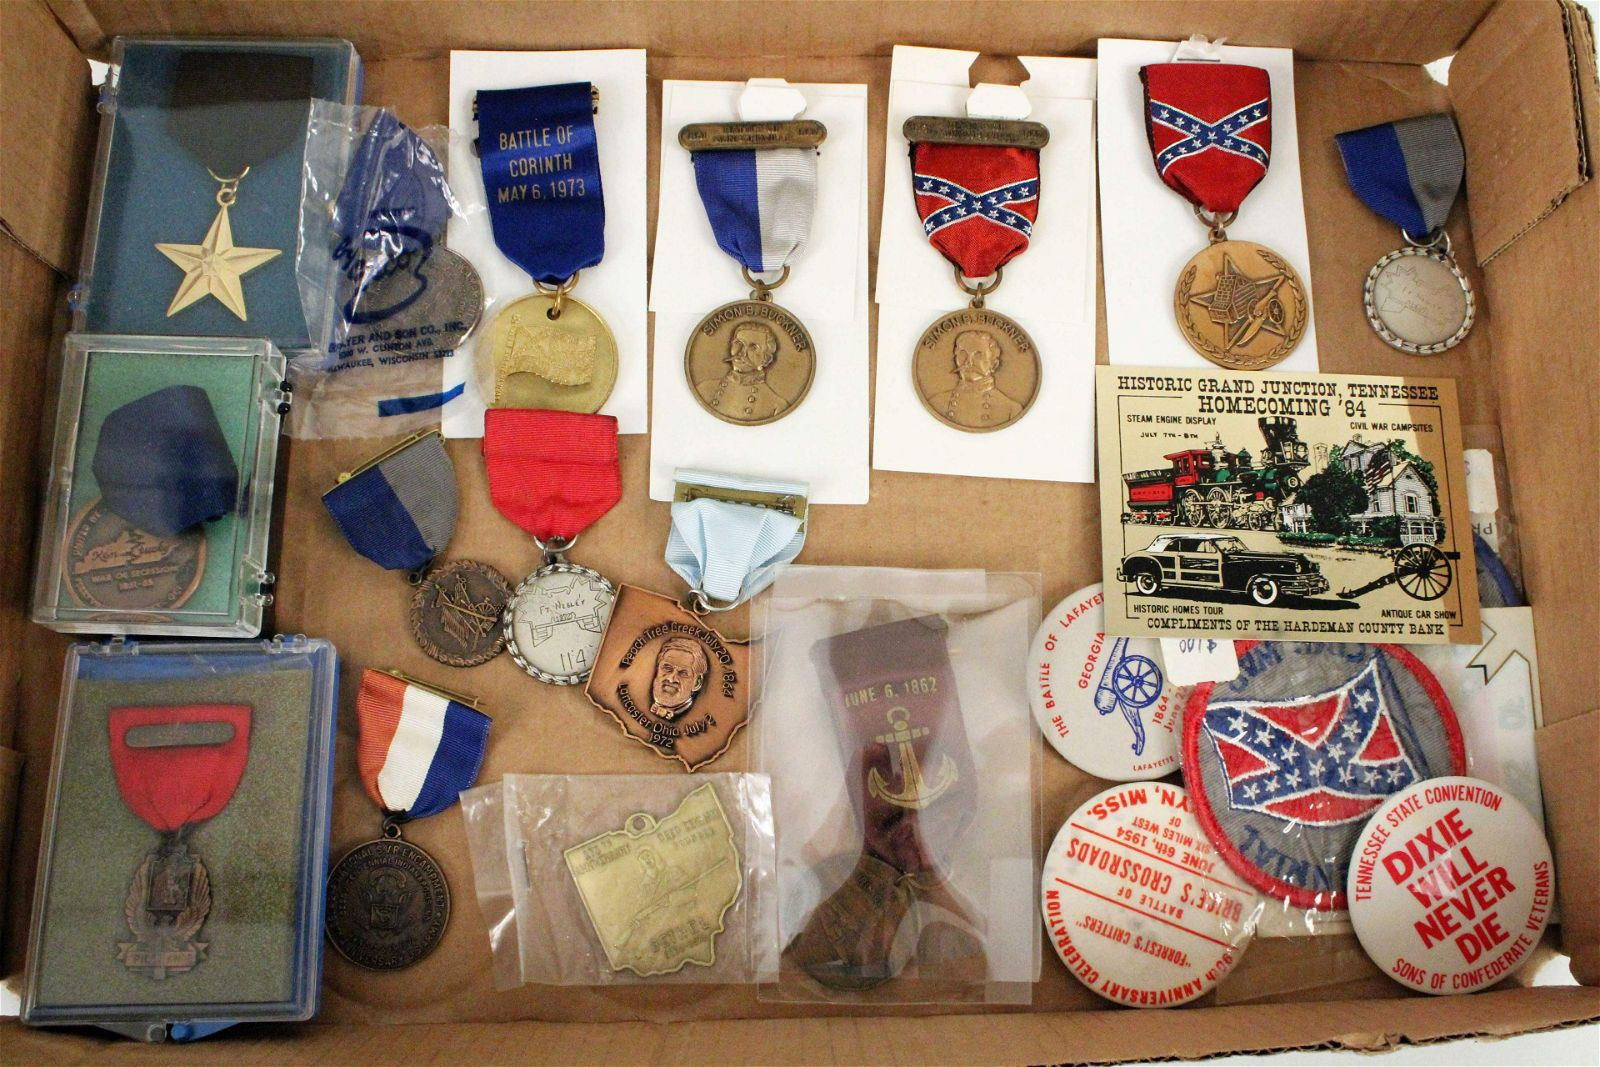 Group of Commemorative Civil War Medals